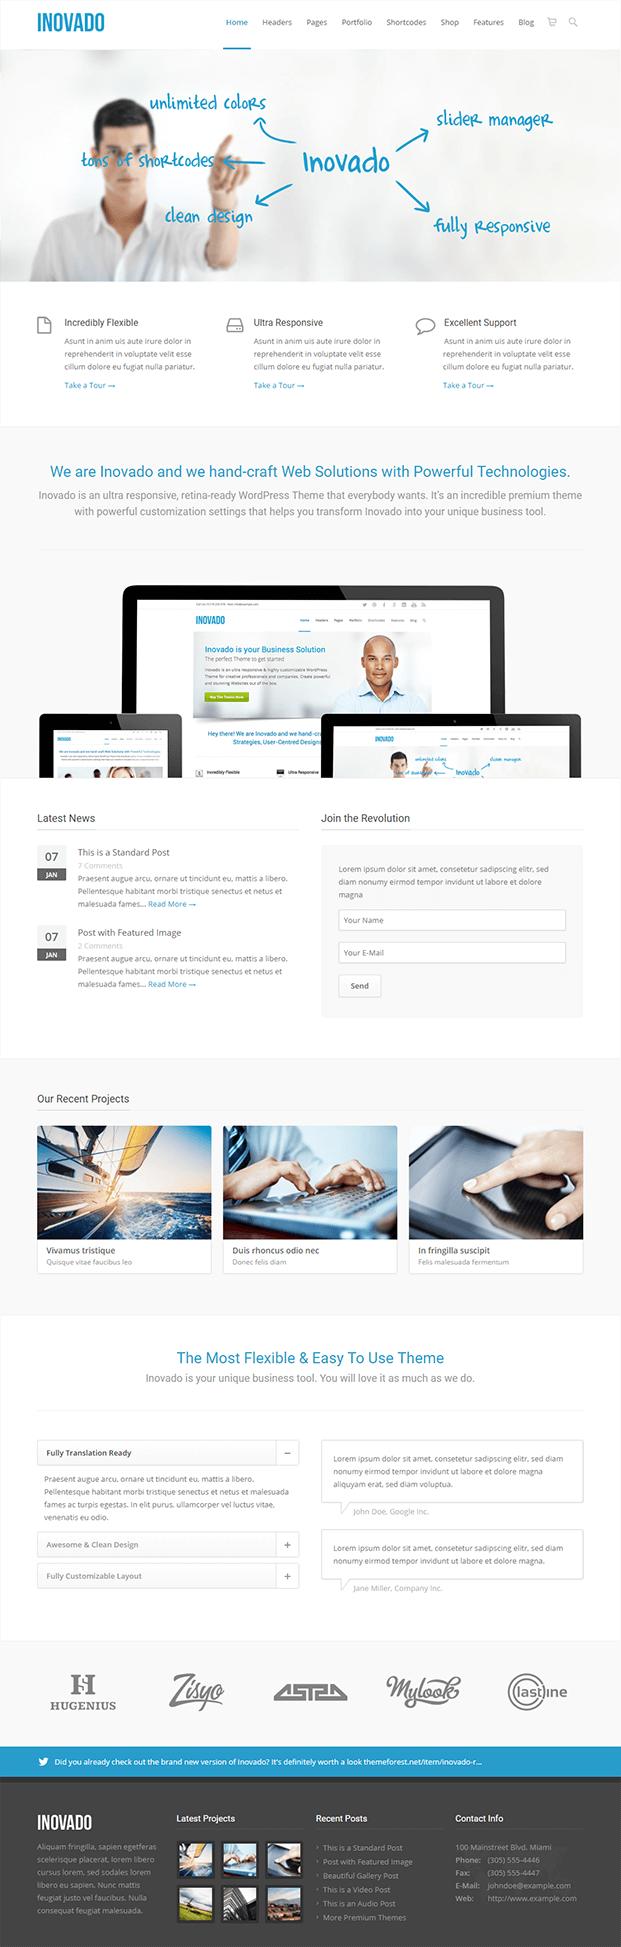 Home - Customisable WordPress Theme